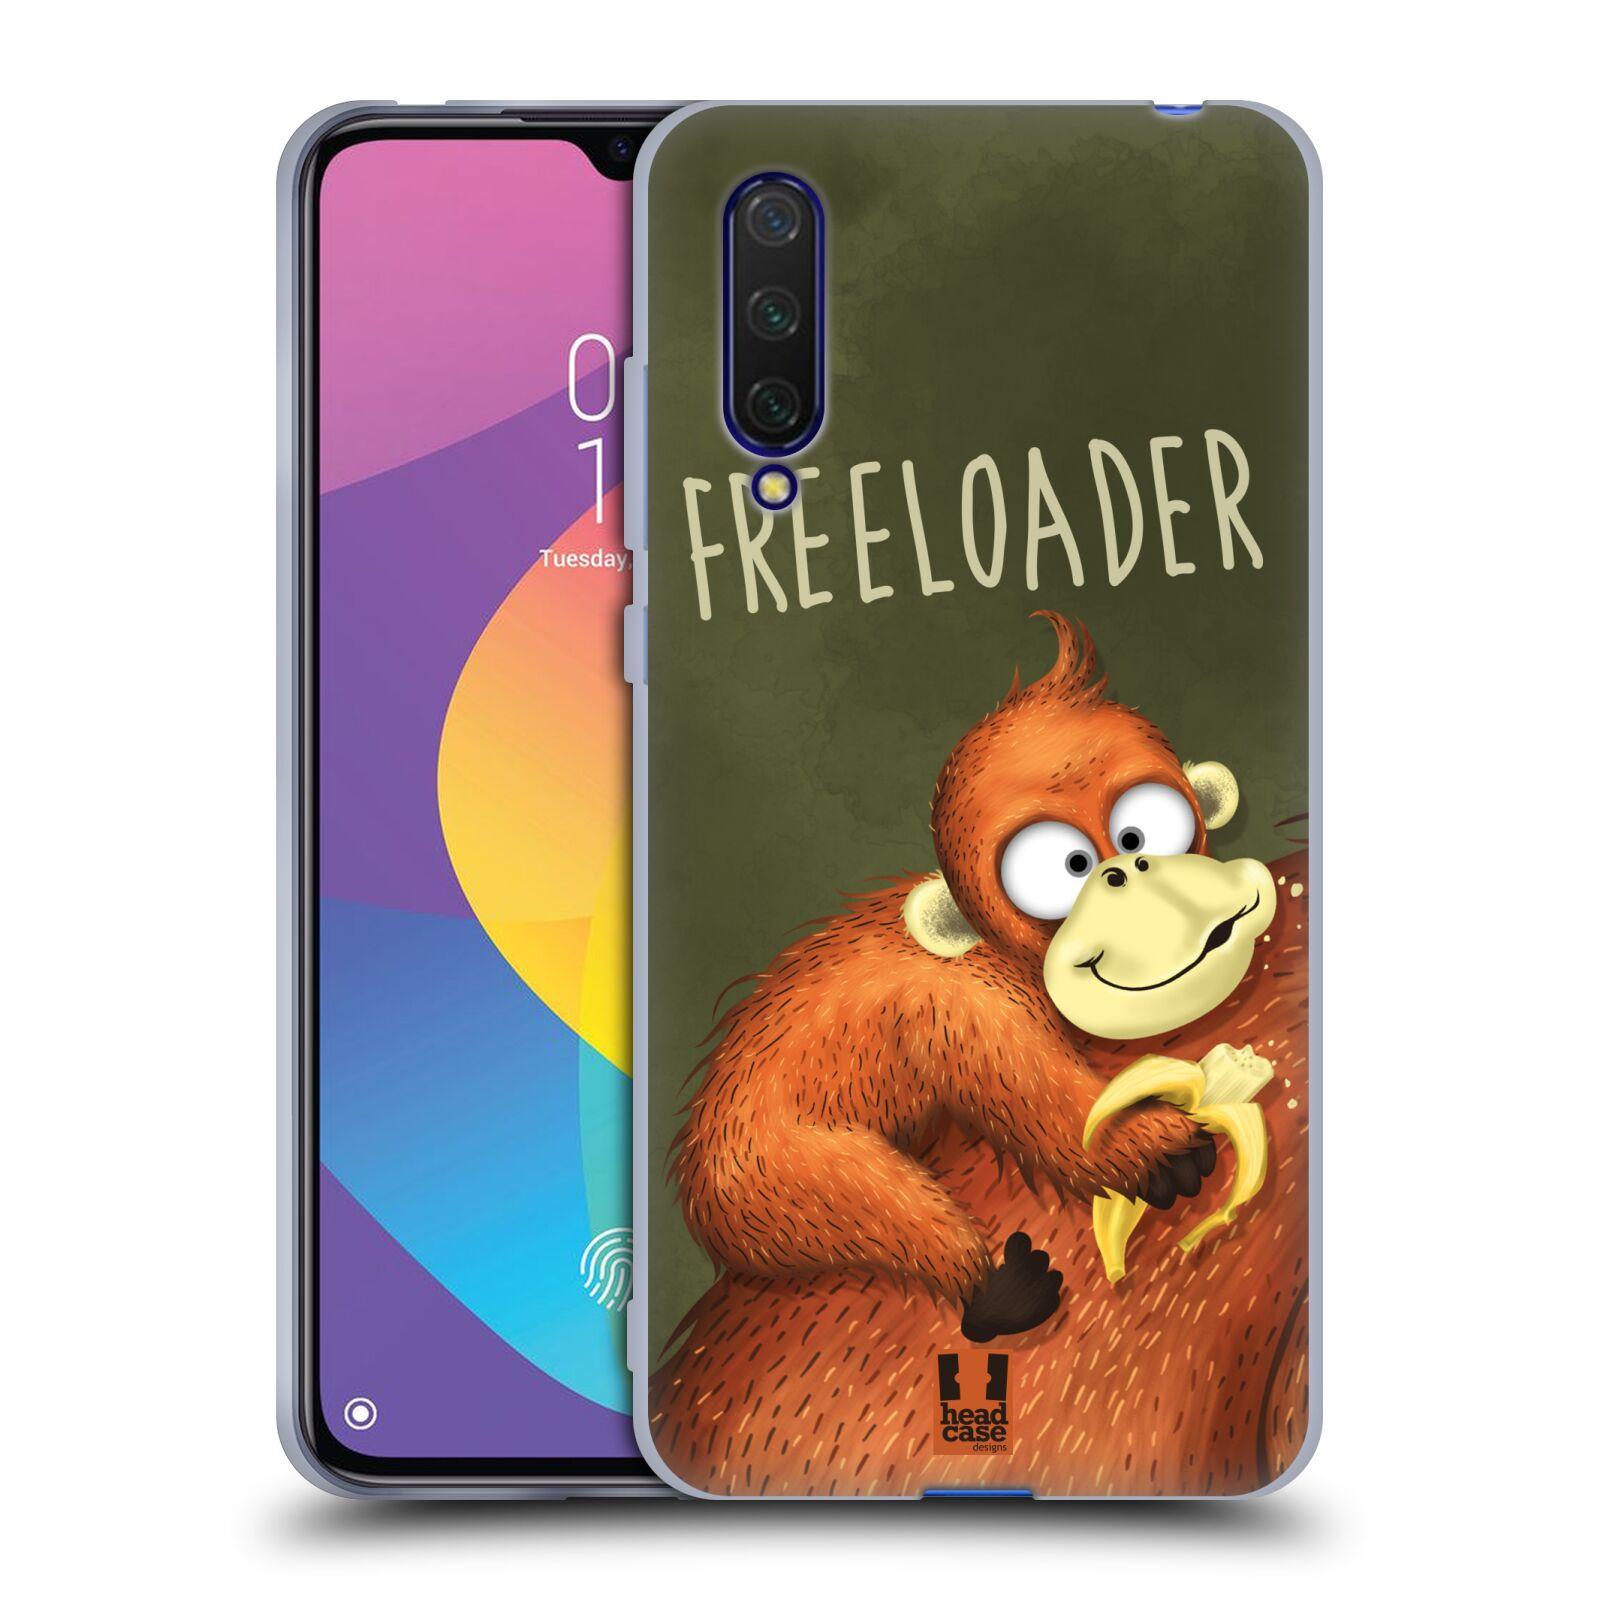 Silikonové pouzdro na mobil Xiaomi Mi 9 Lite - Head Case - Opičák Freeloader